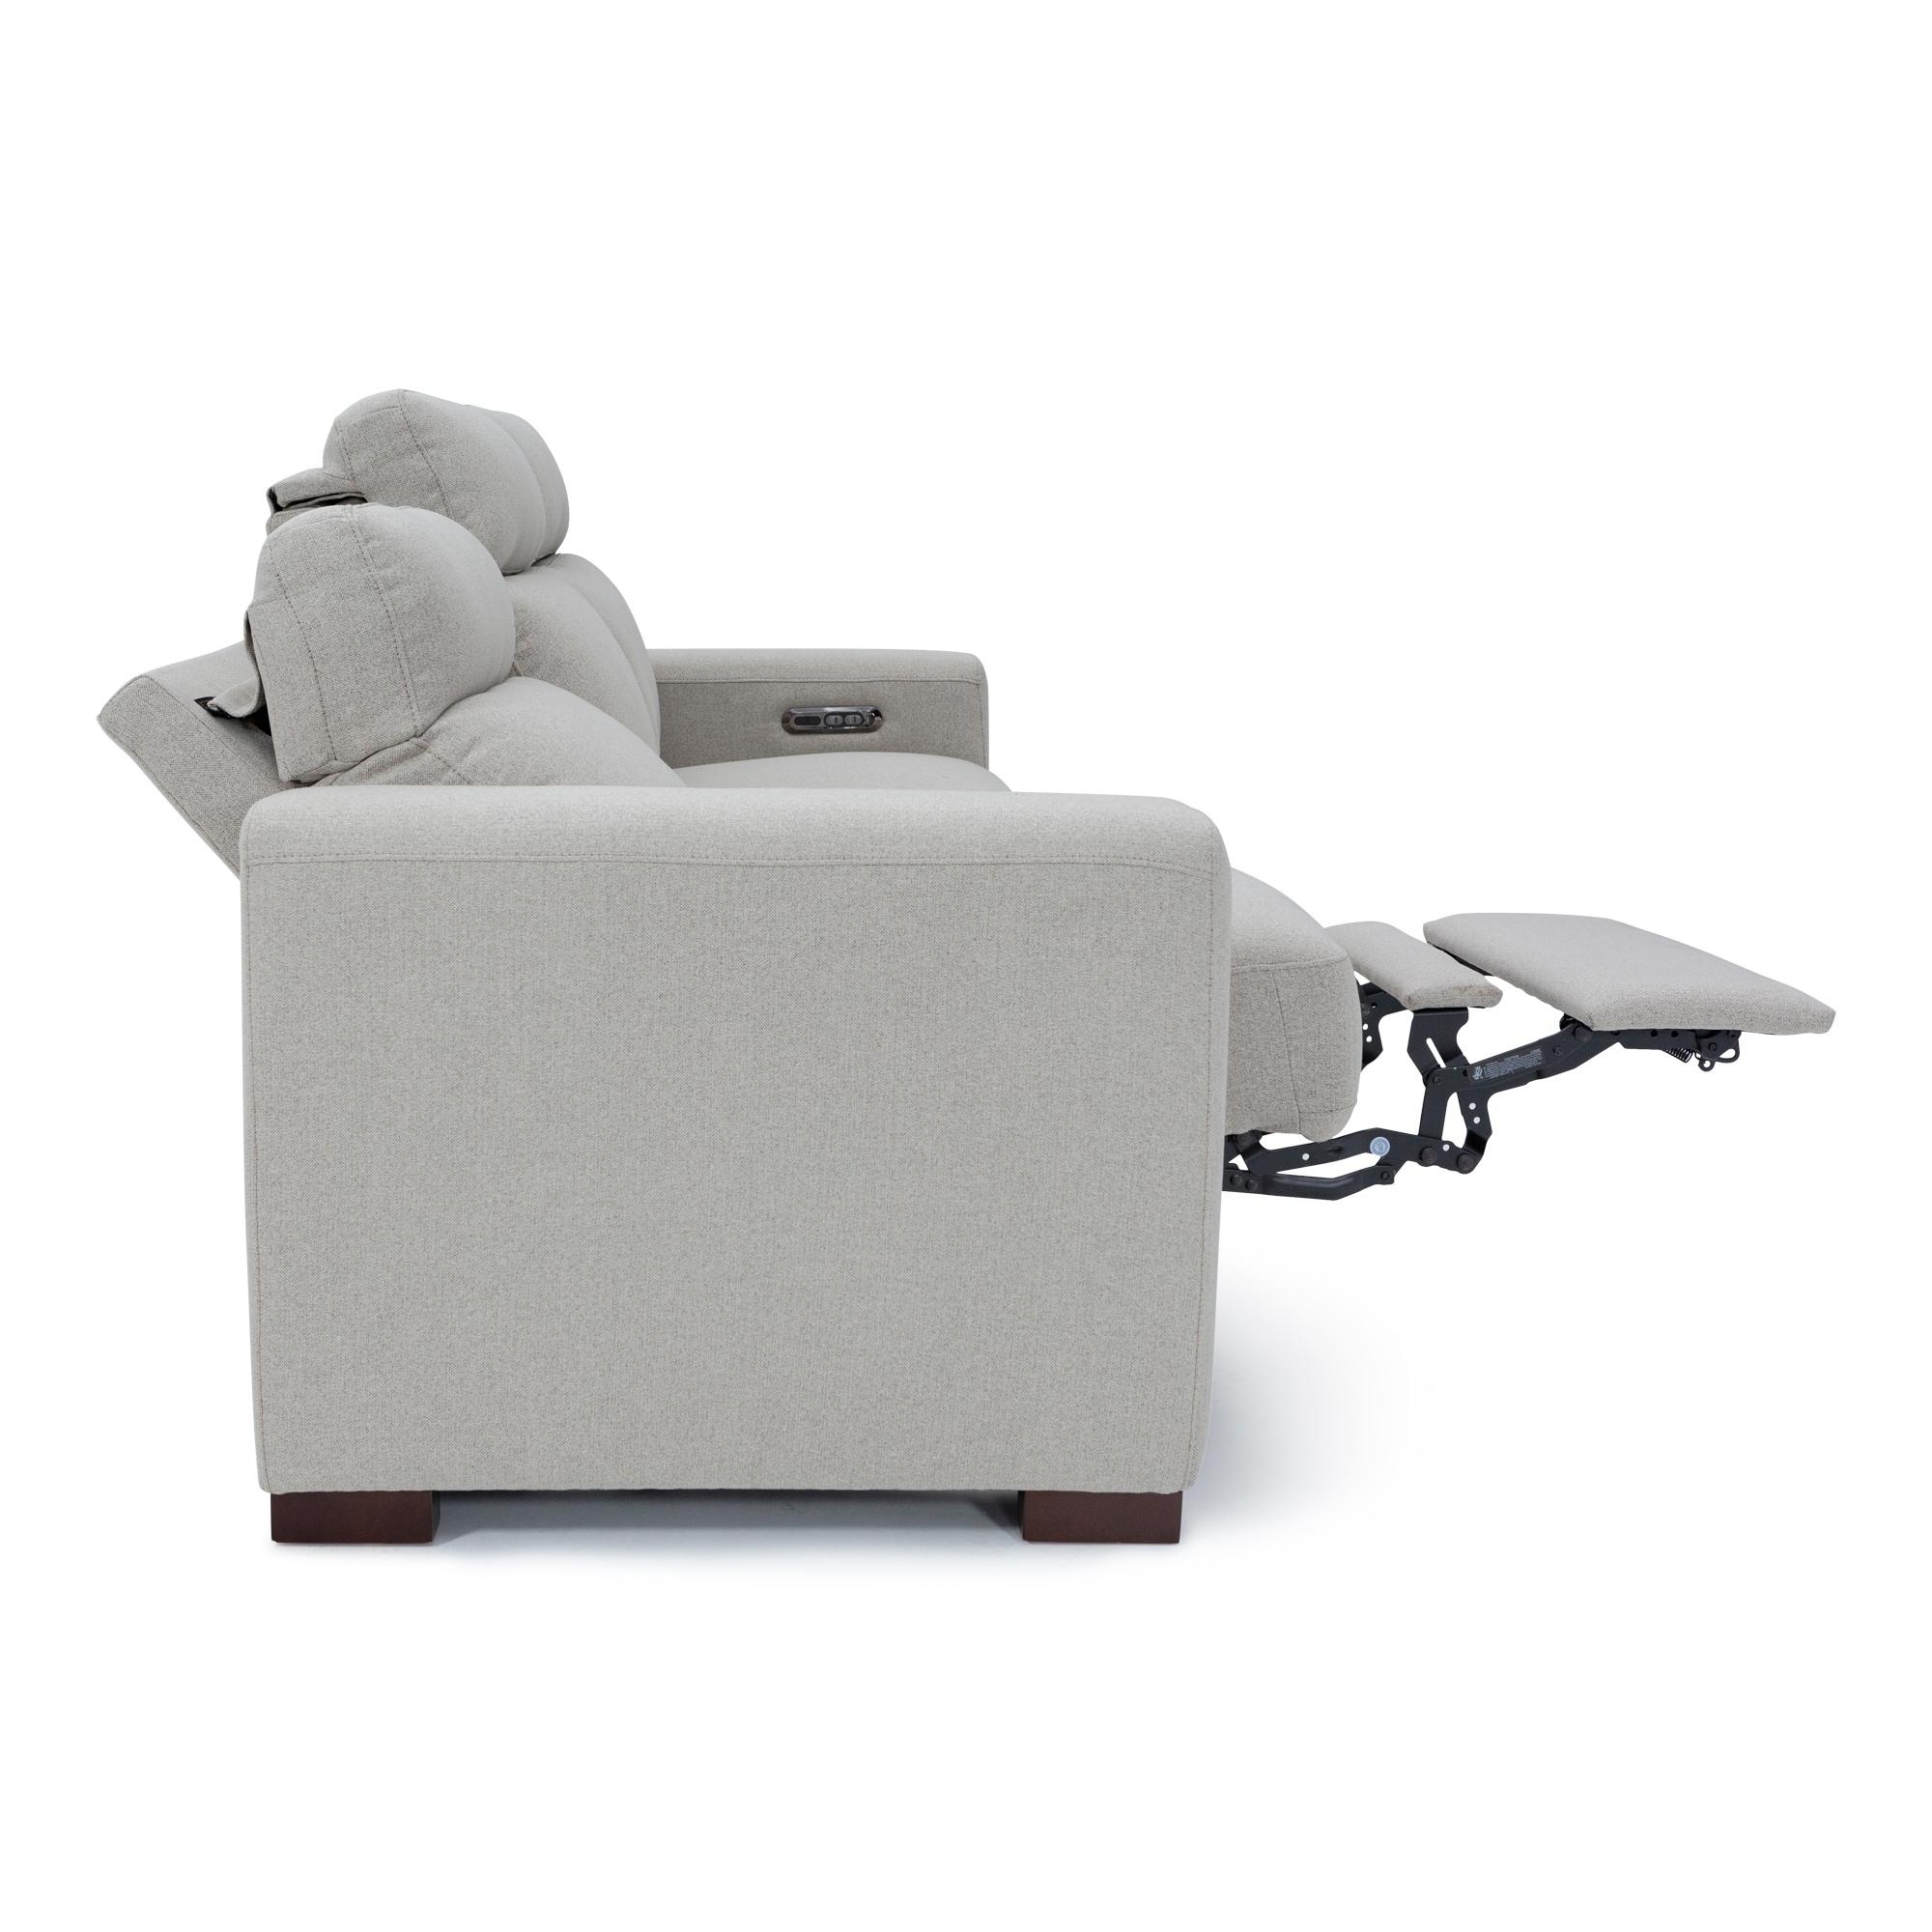 Home Furniture Diy Folding Fabric Recliner Armchair Sofa